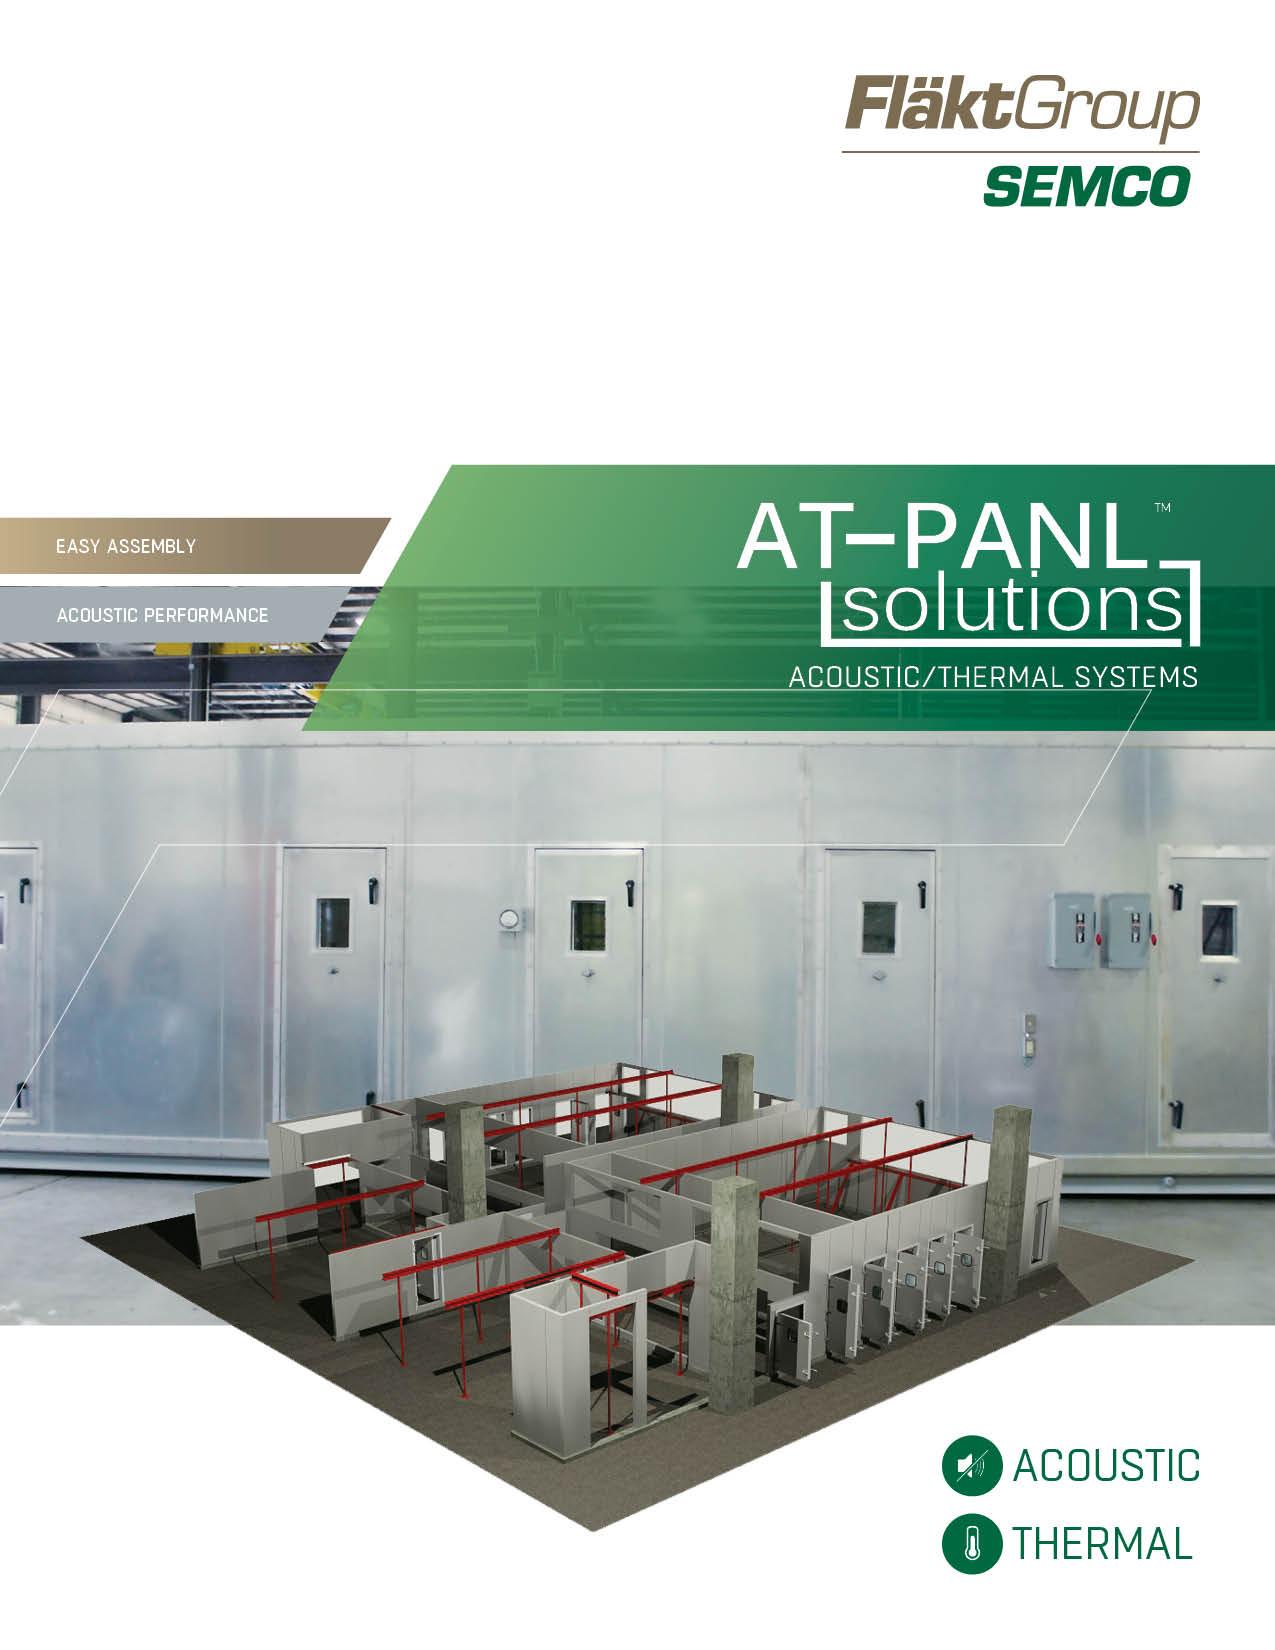 Acoustic Thermal Panels Sales Brochure - FlaktGroup Semco 2018-01.jpg